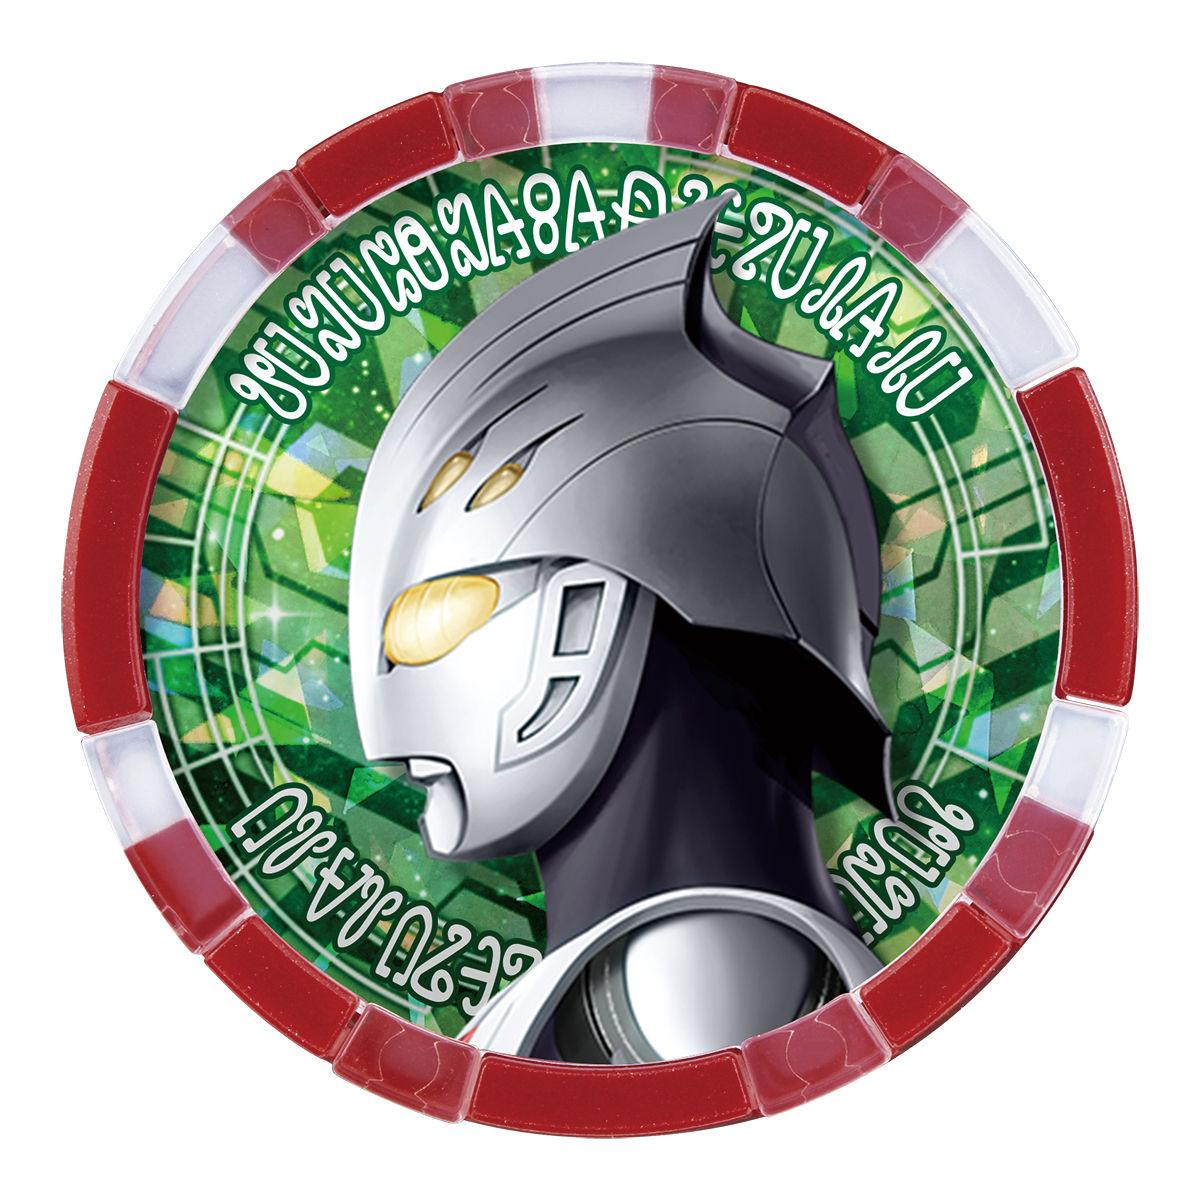 DXウルトラメダル ウルトラレジェンドセット01